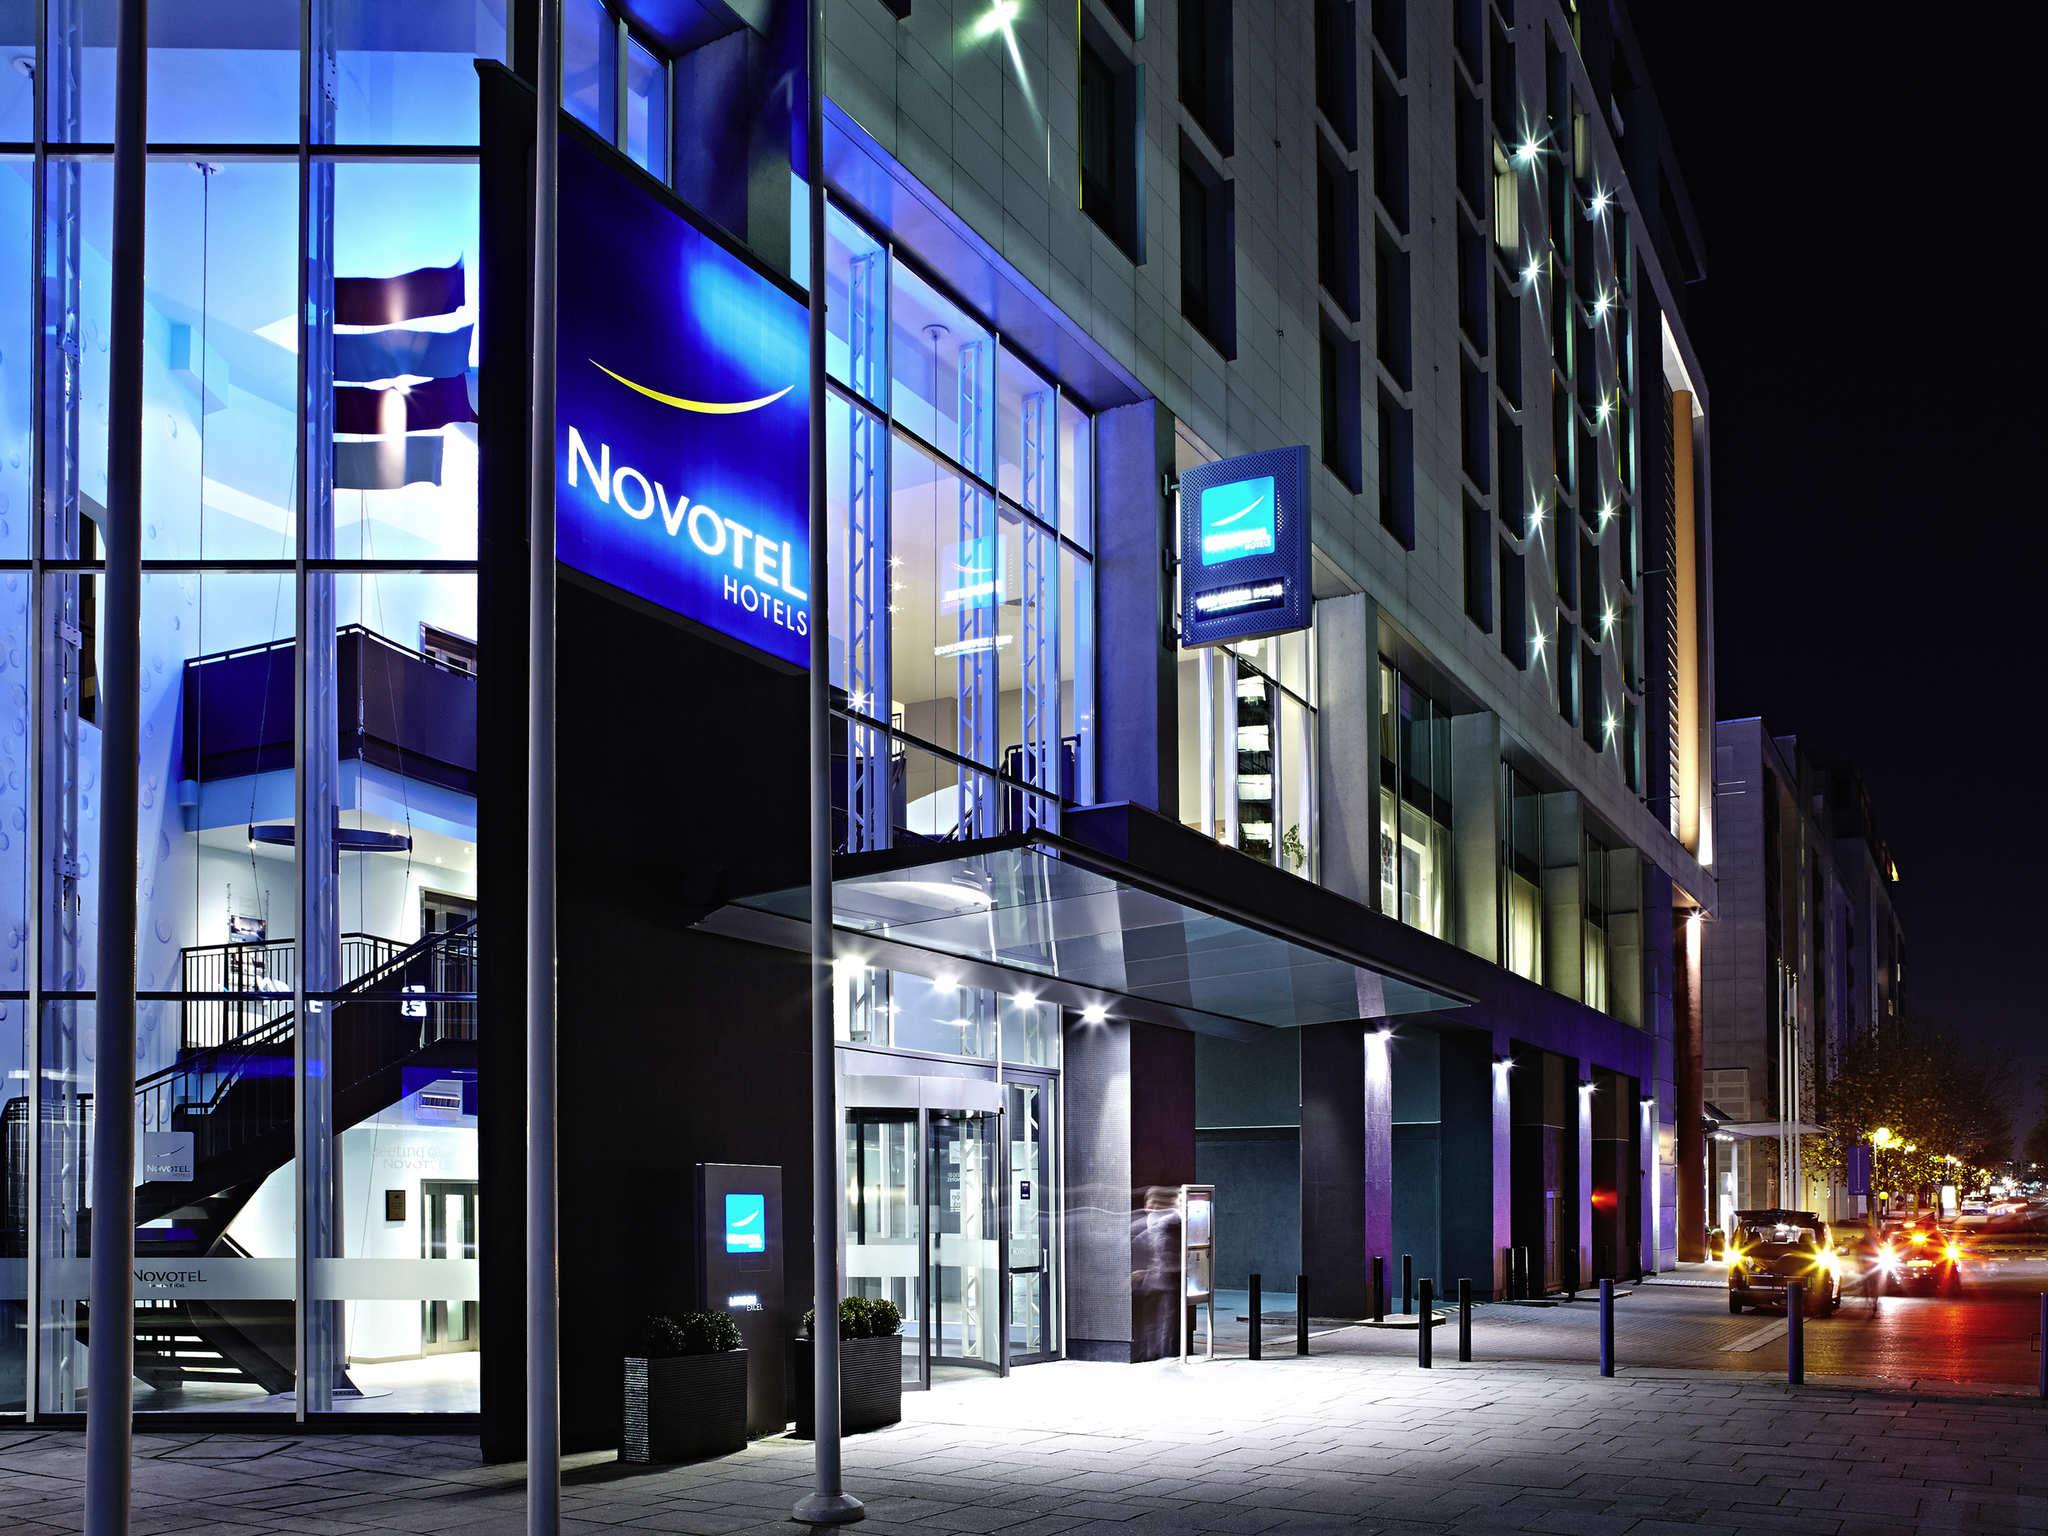 Hotel – Novotel Londen Excel